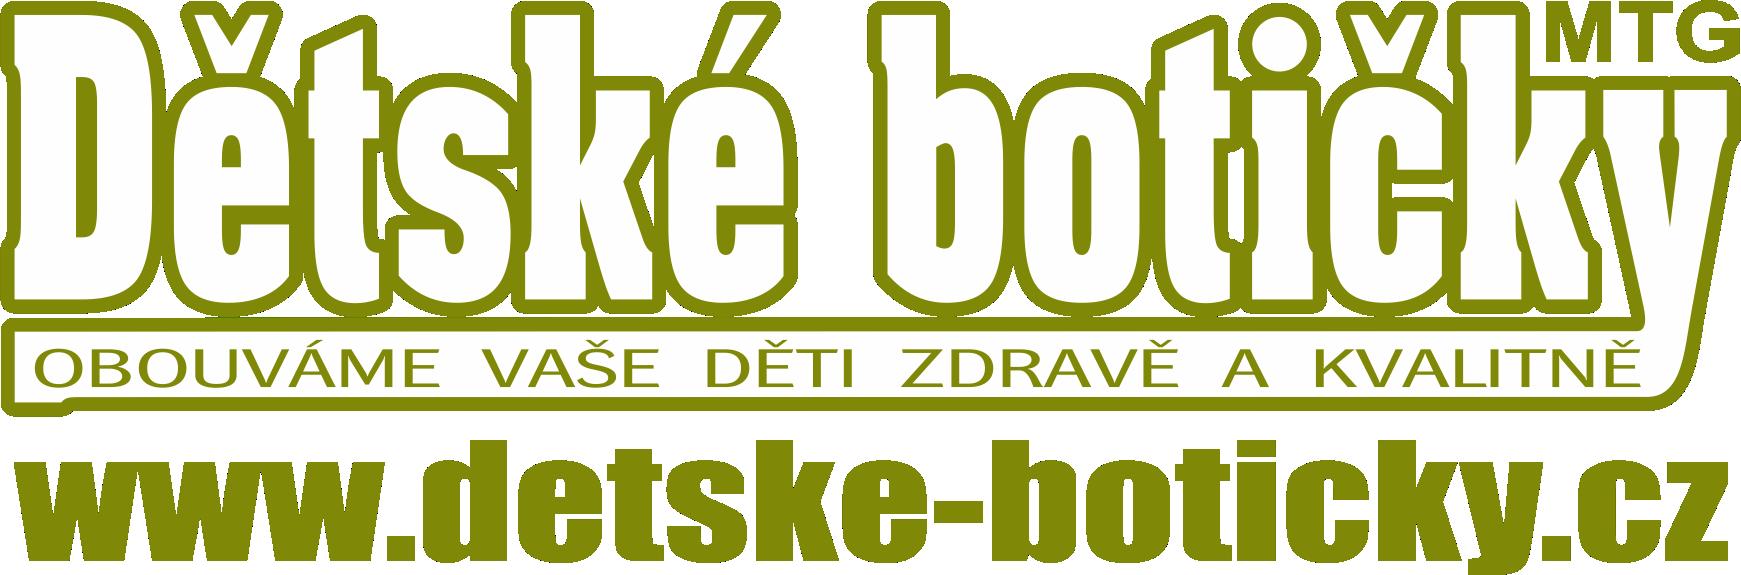 logo detske-boticky